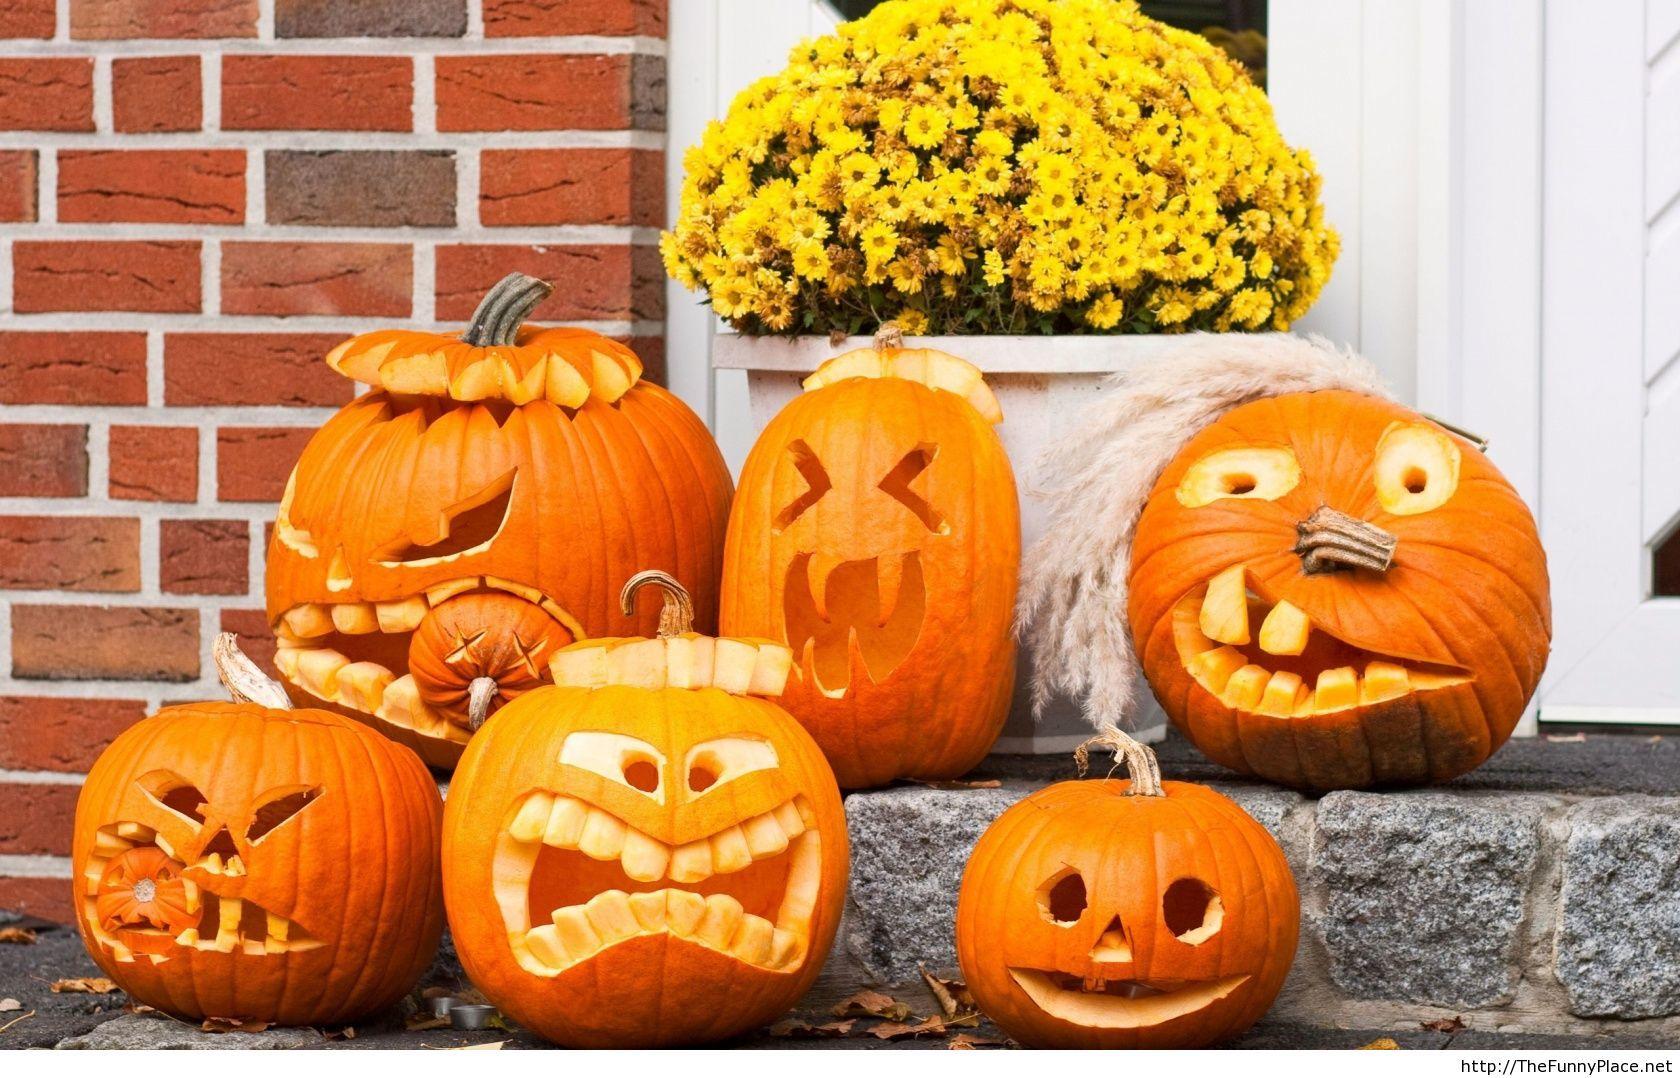 Funny halloween pumpkins 2013 picture